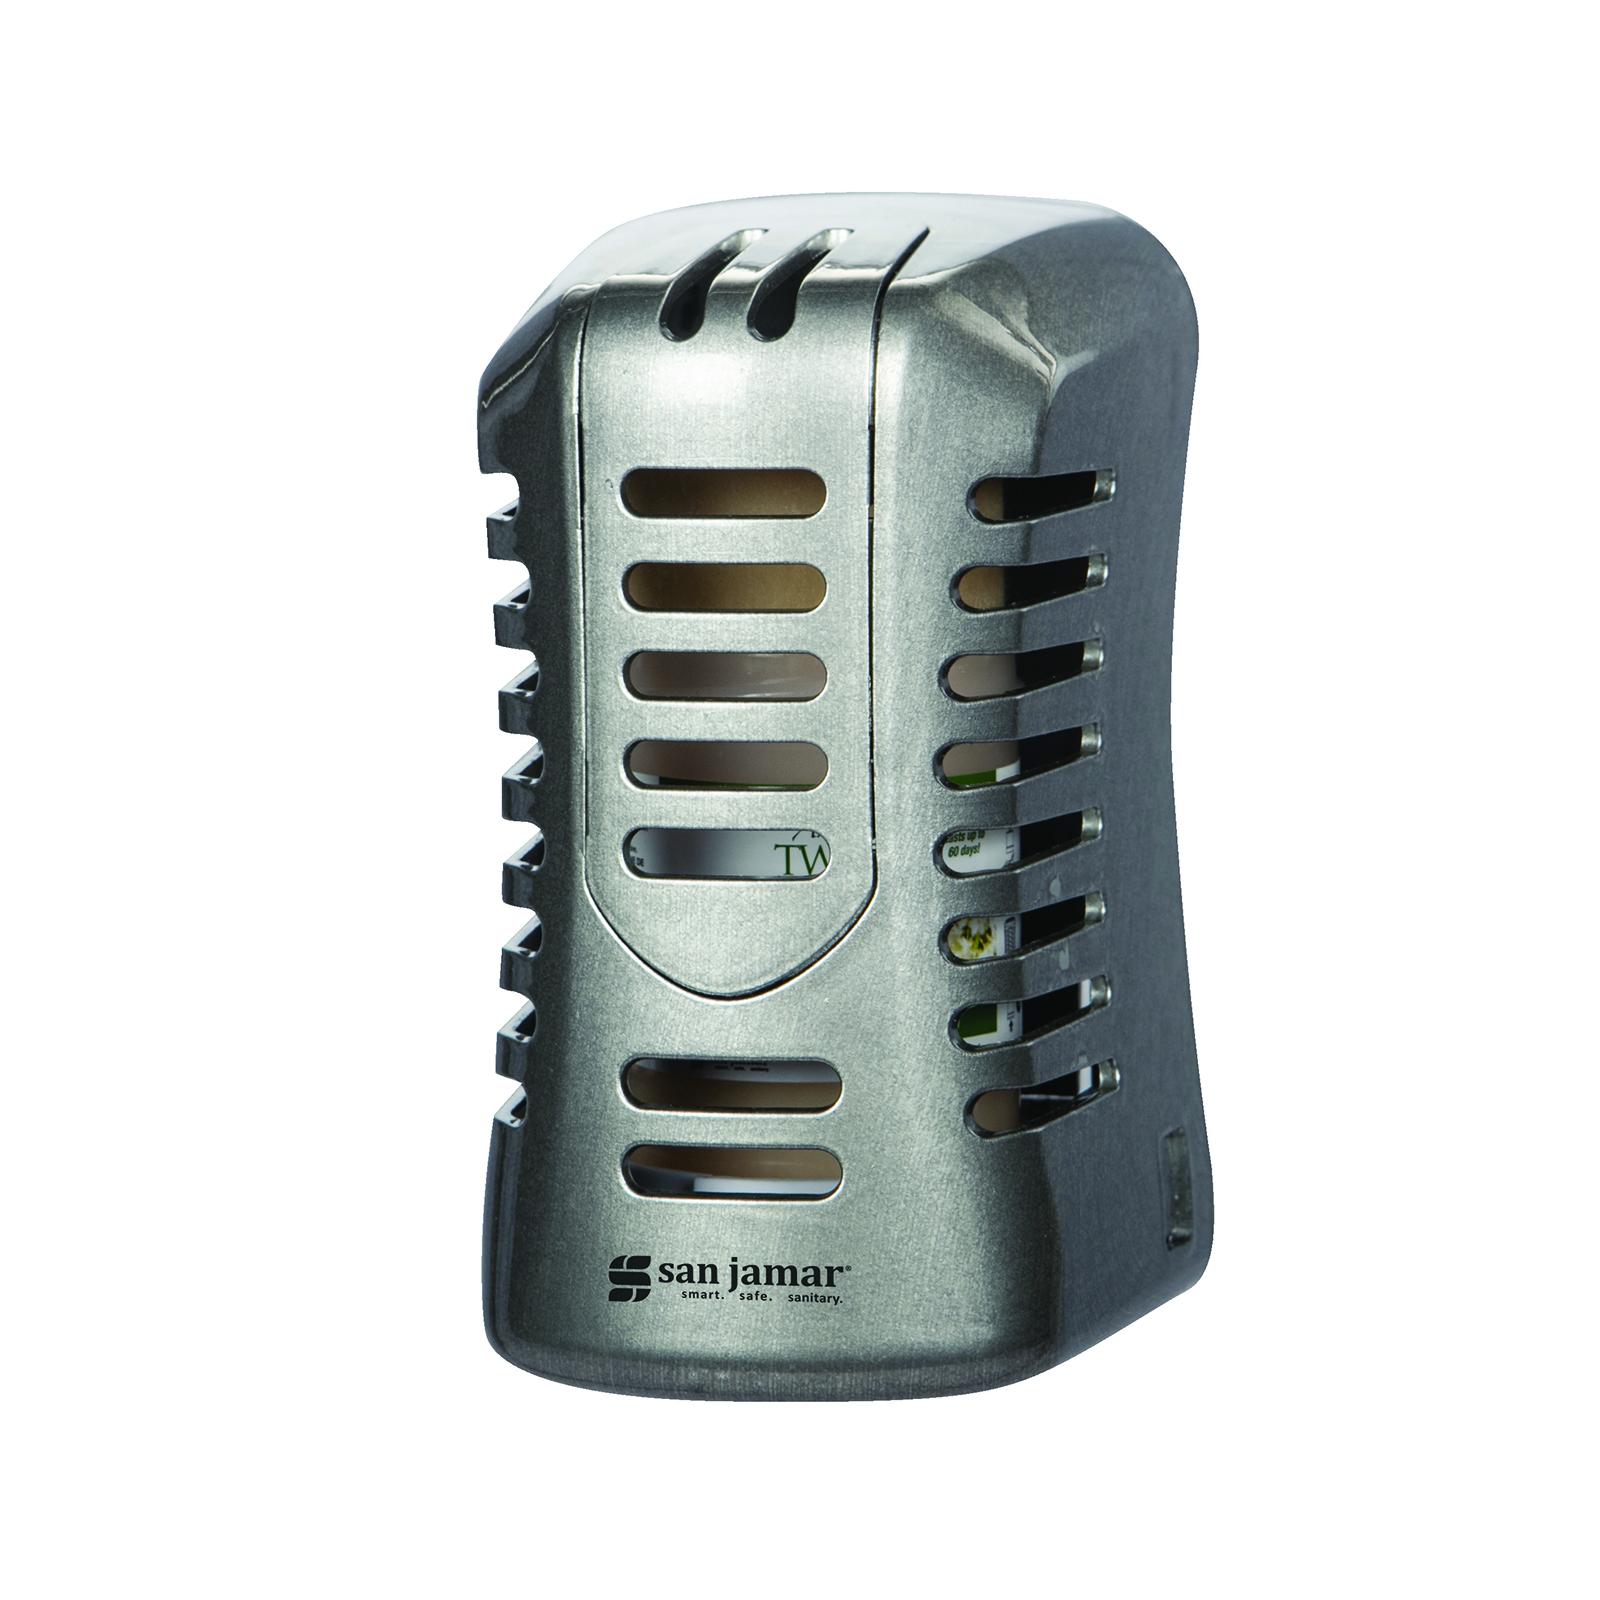 San Jamar WP9070SS air freshener dispenser